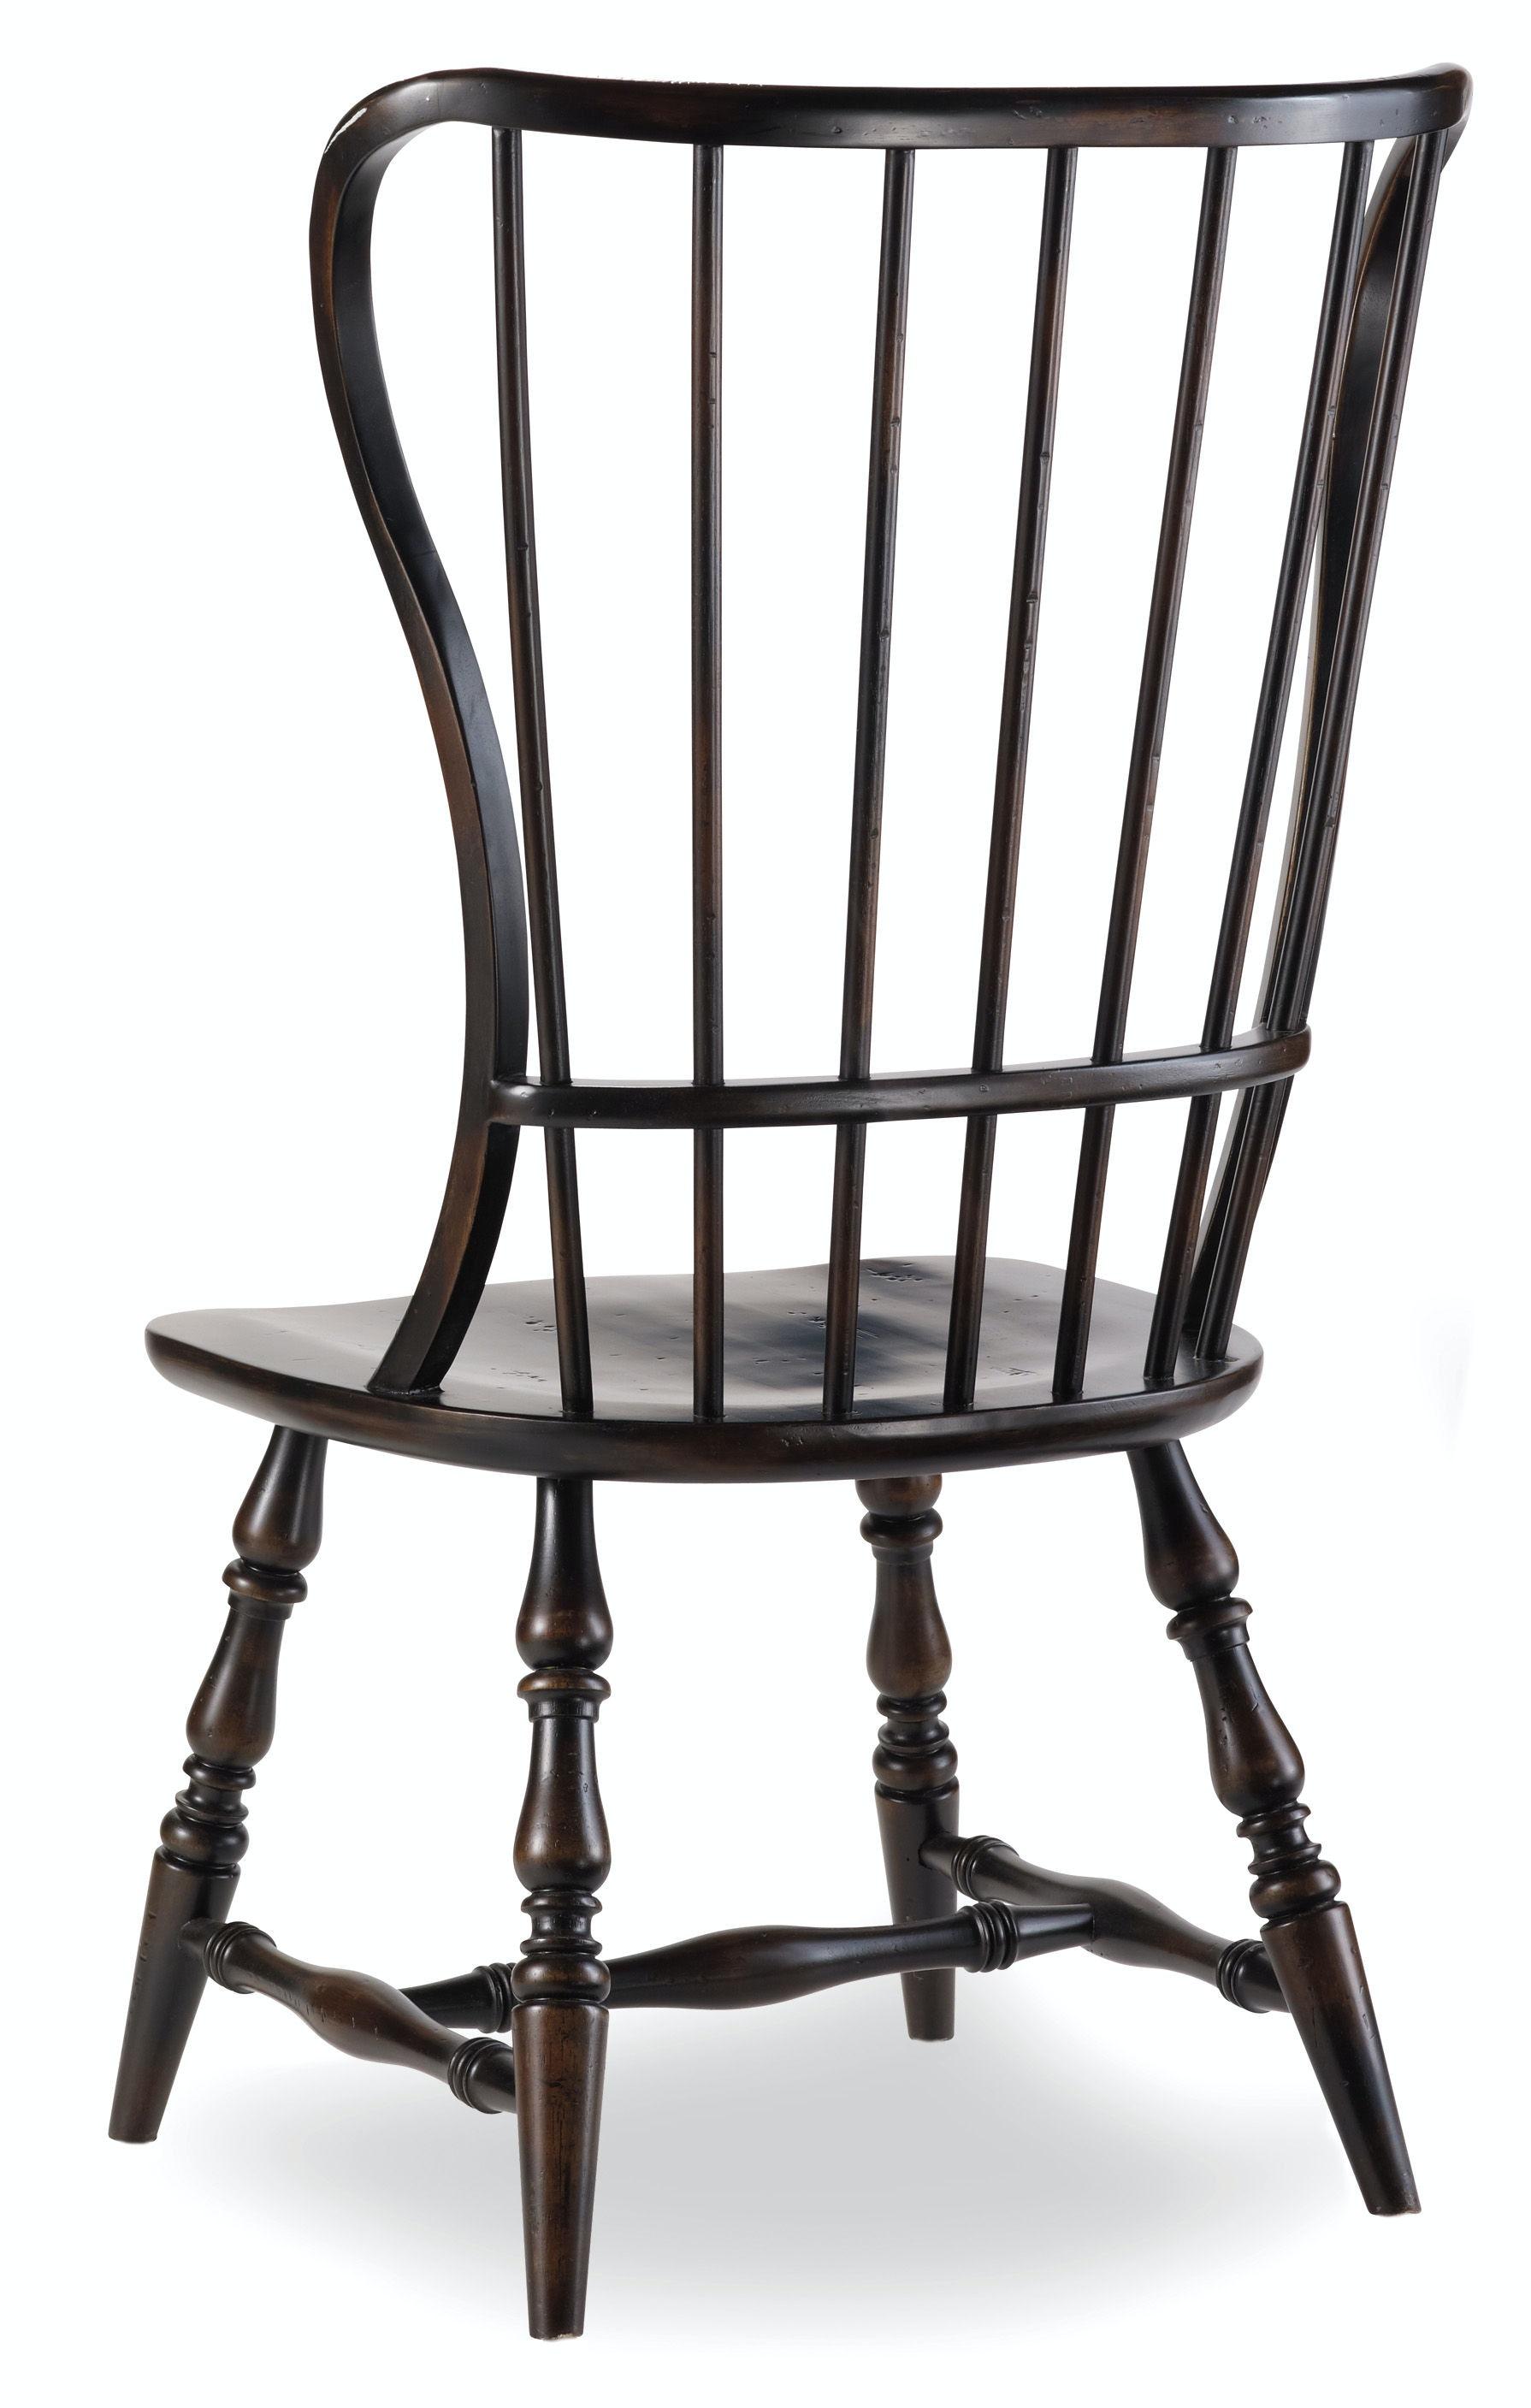 Merveilleux Hooker Furniture Sanctuary Spindle Side Chair Ebony 3005 75310